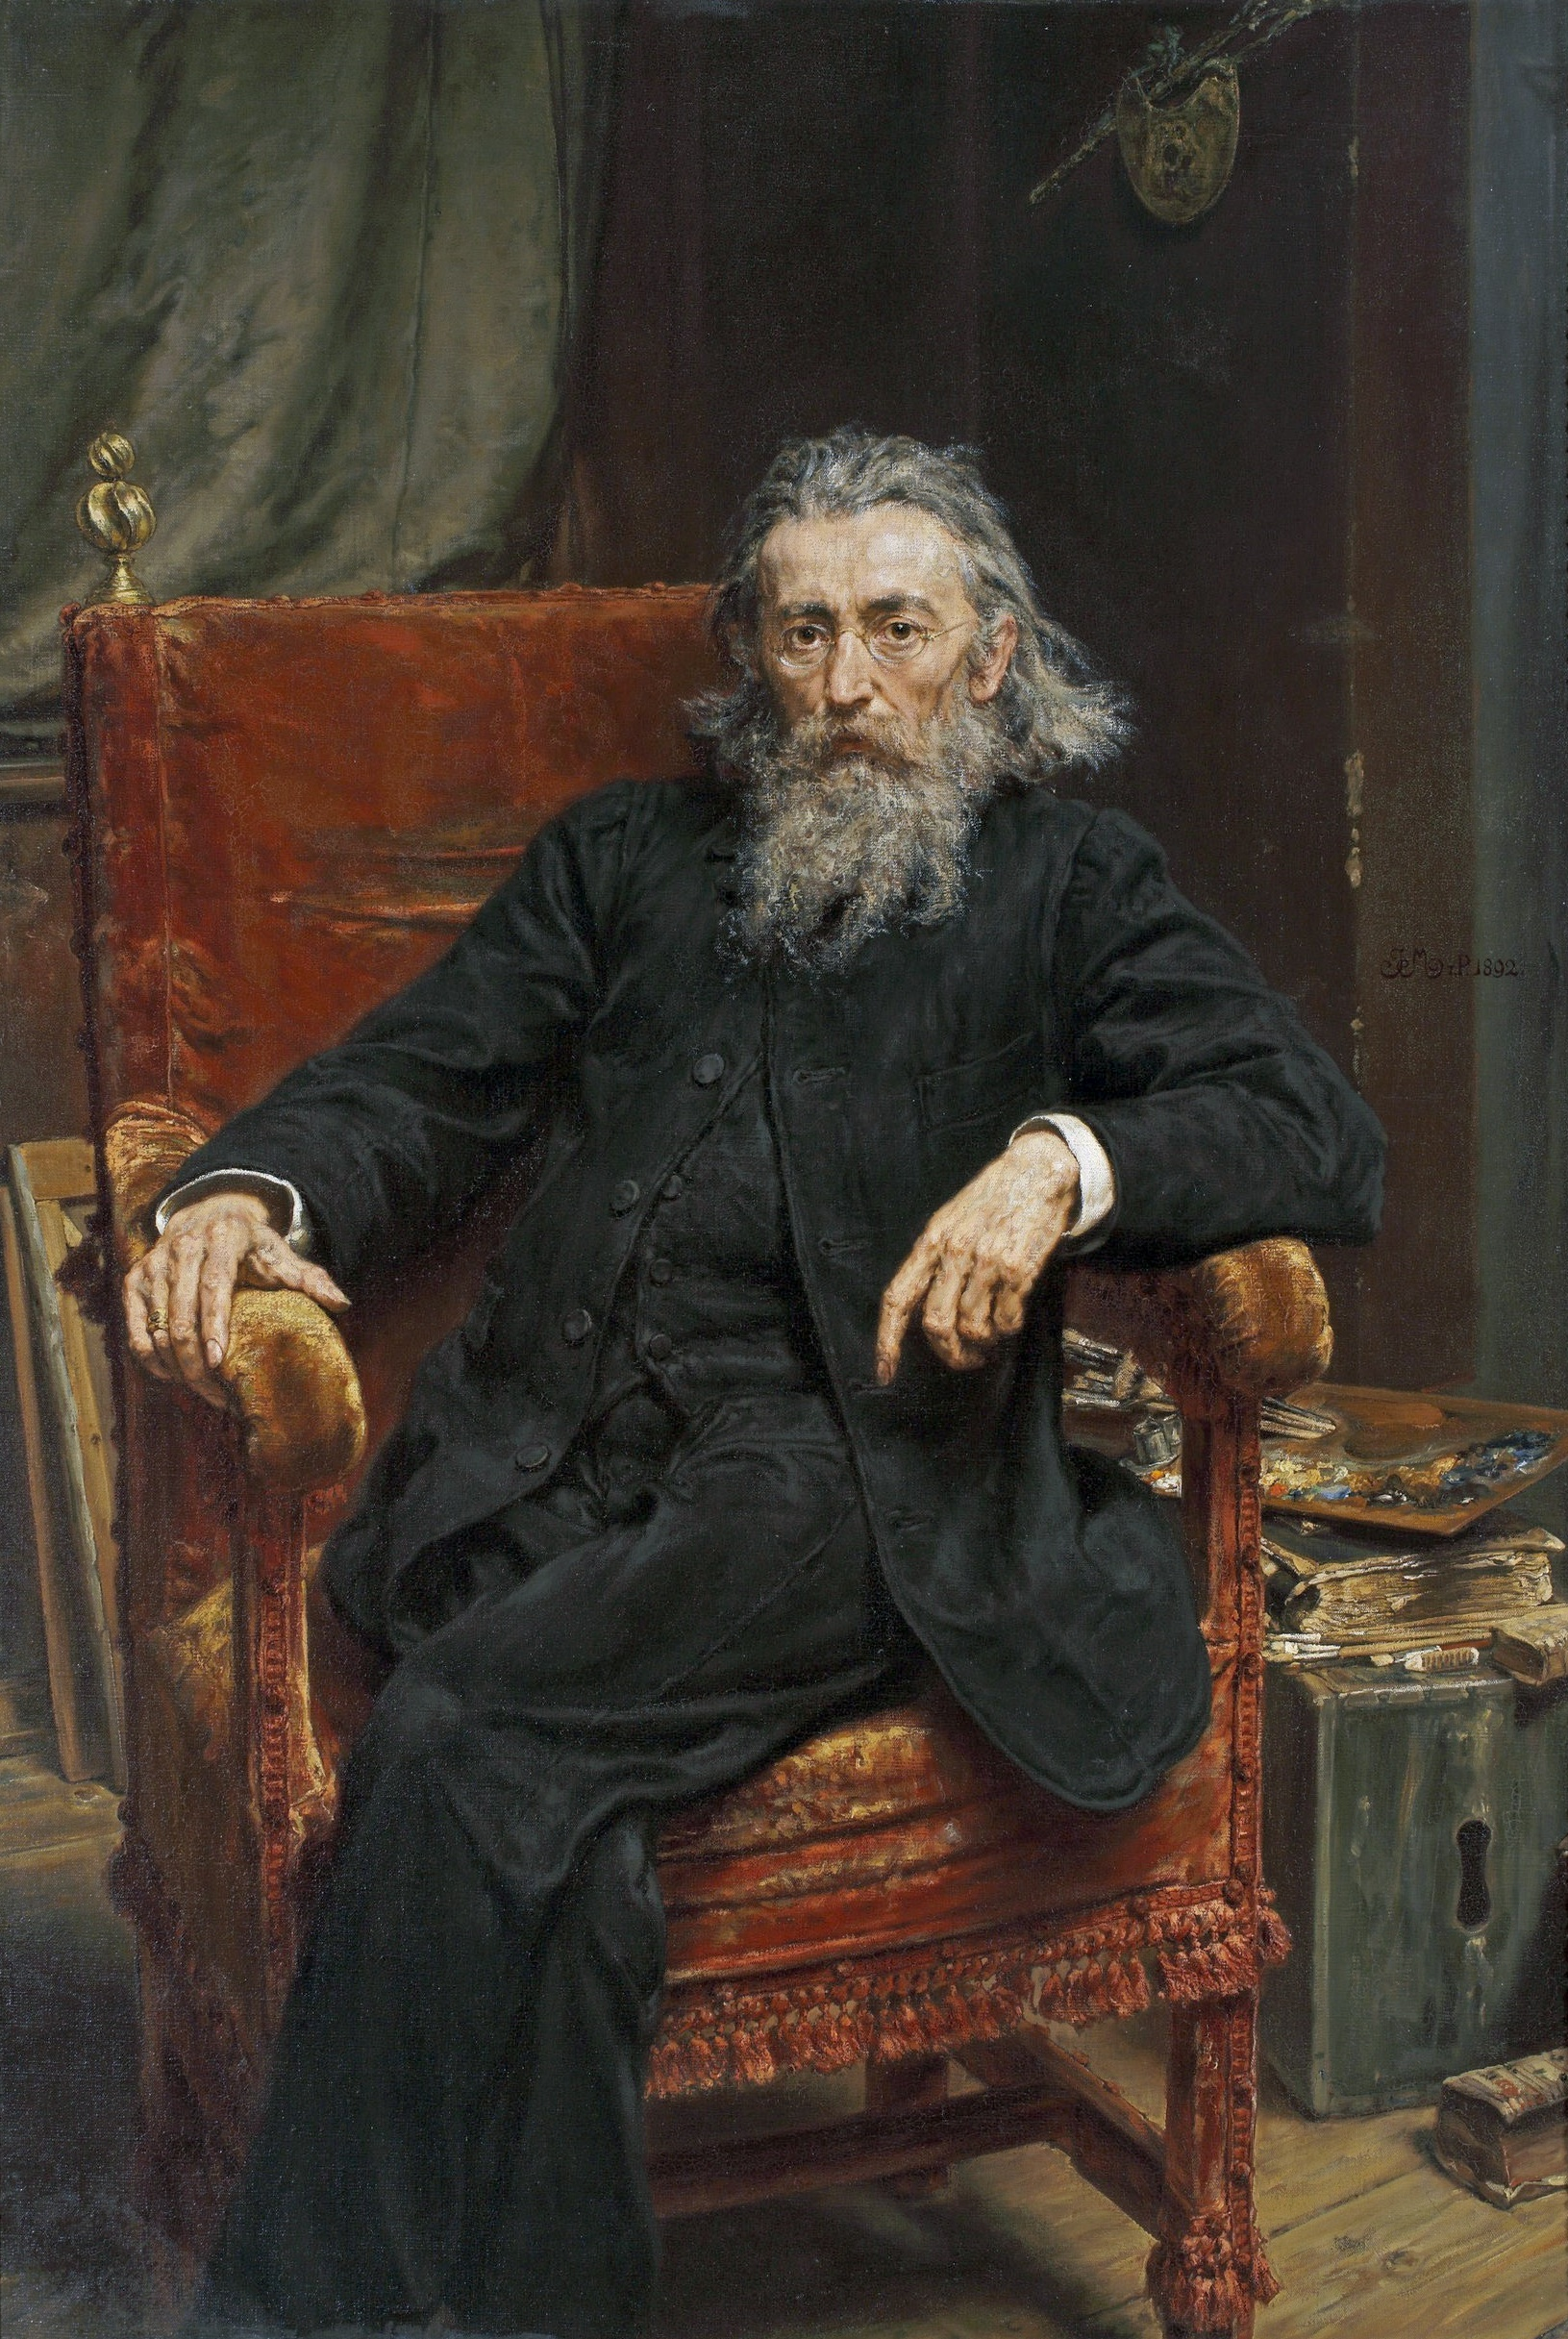 File:Matejko Self-portrait.jpg - Wikipedia